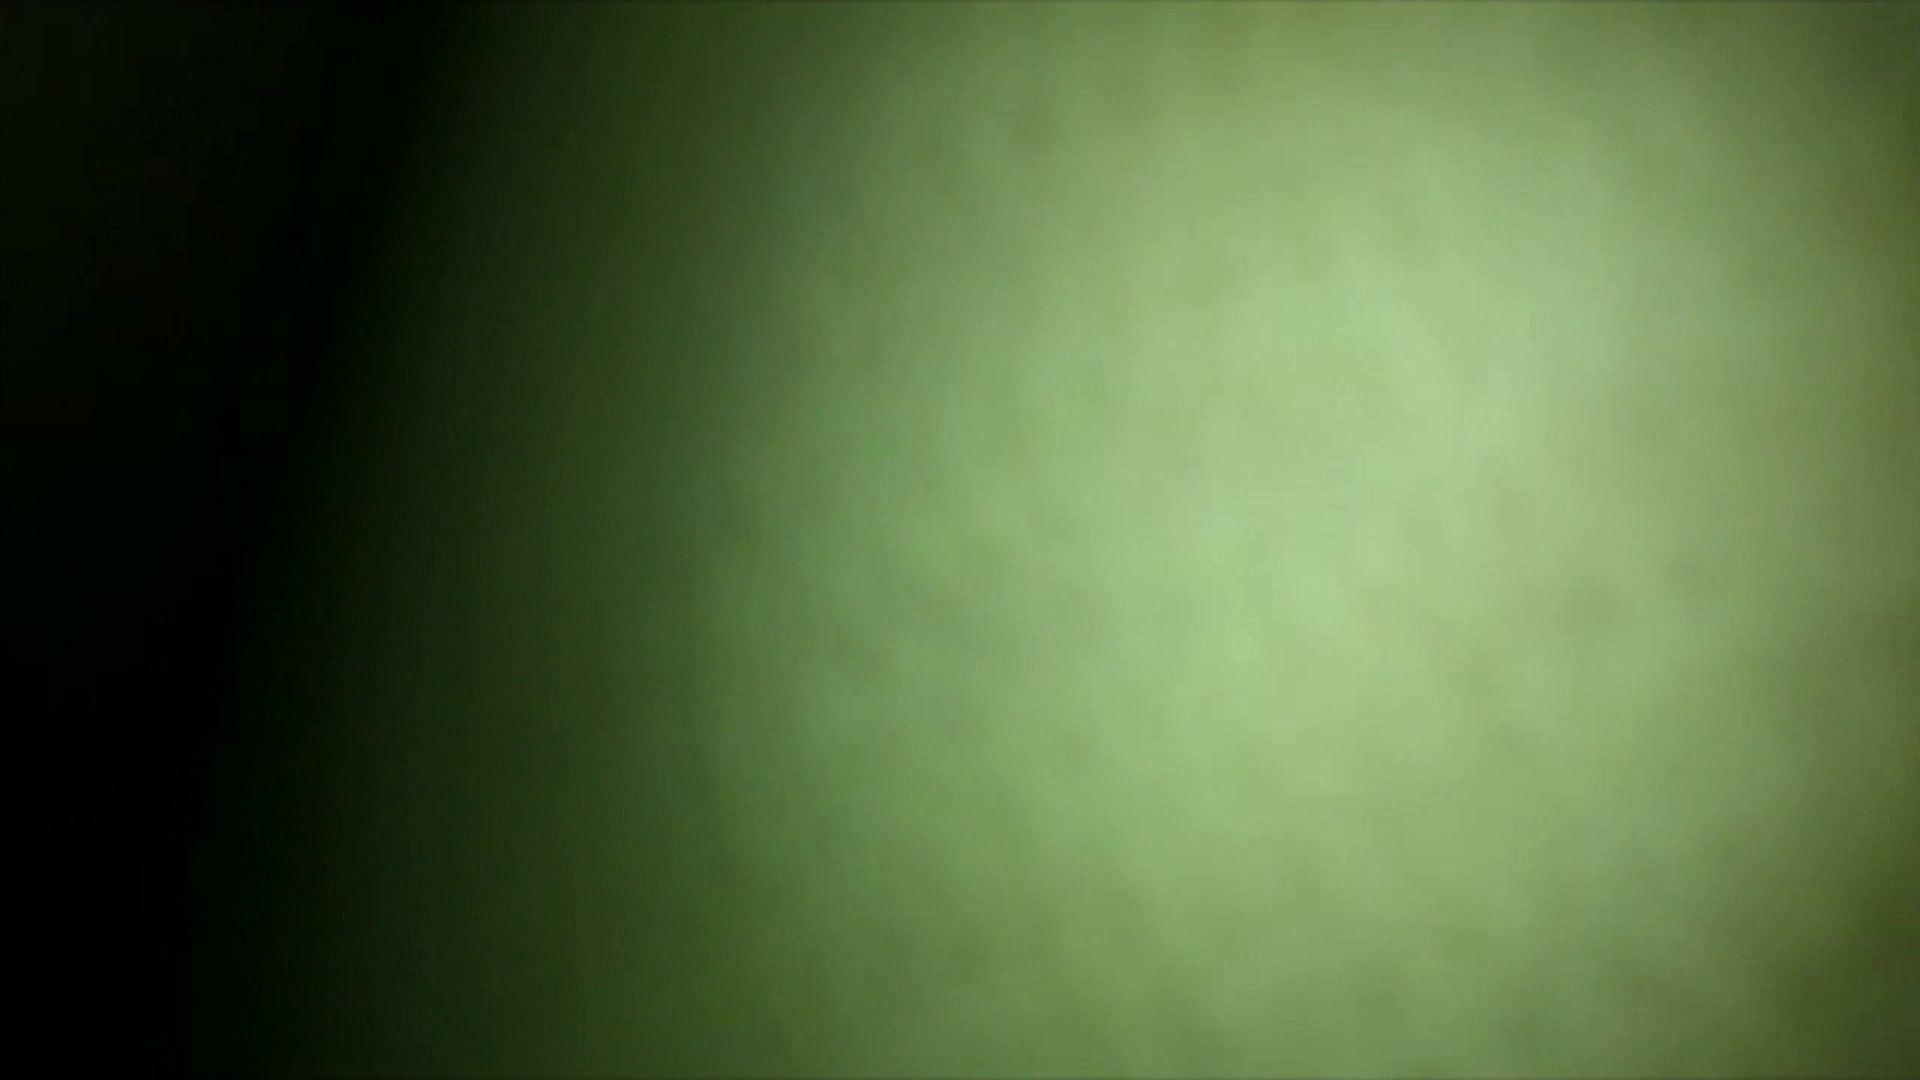 vol.22 【YHちゃん】パルコ店員20歳 mixiオフ会で お姉さんの胸チラ  77画像 8